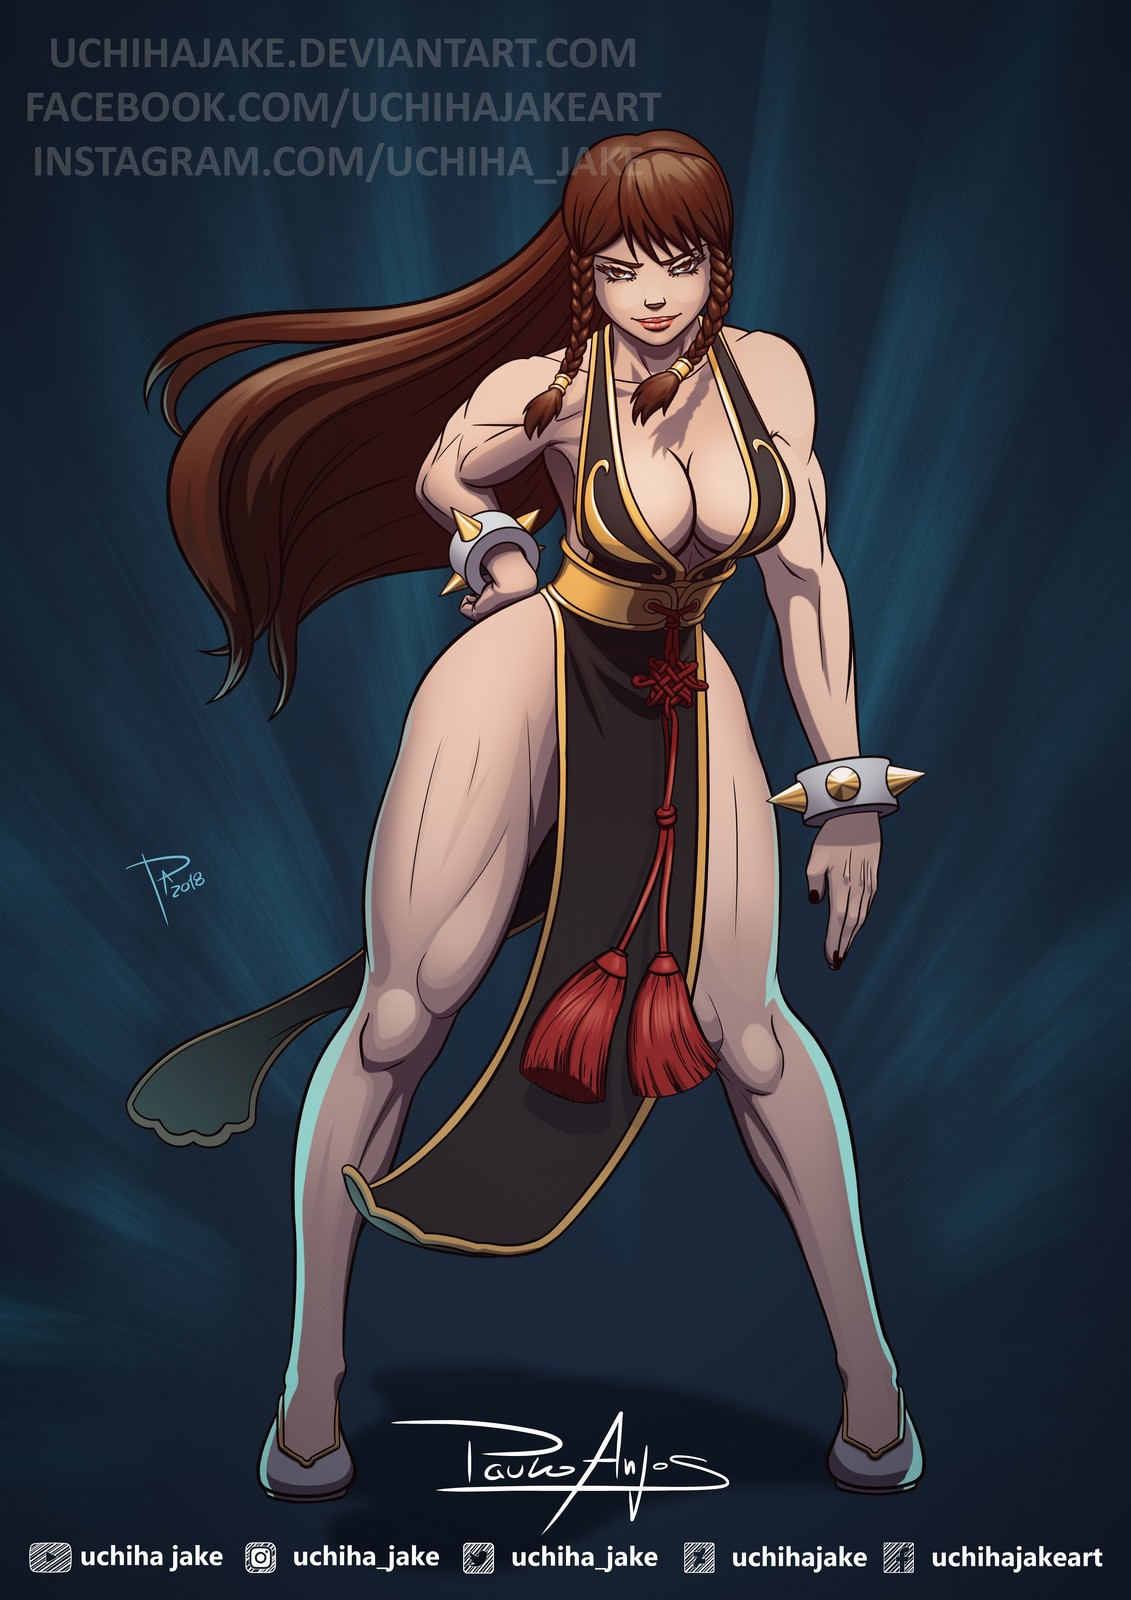 Battle Dress Chun Li